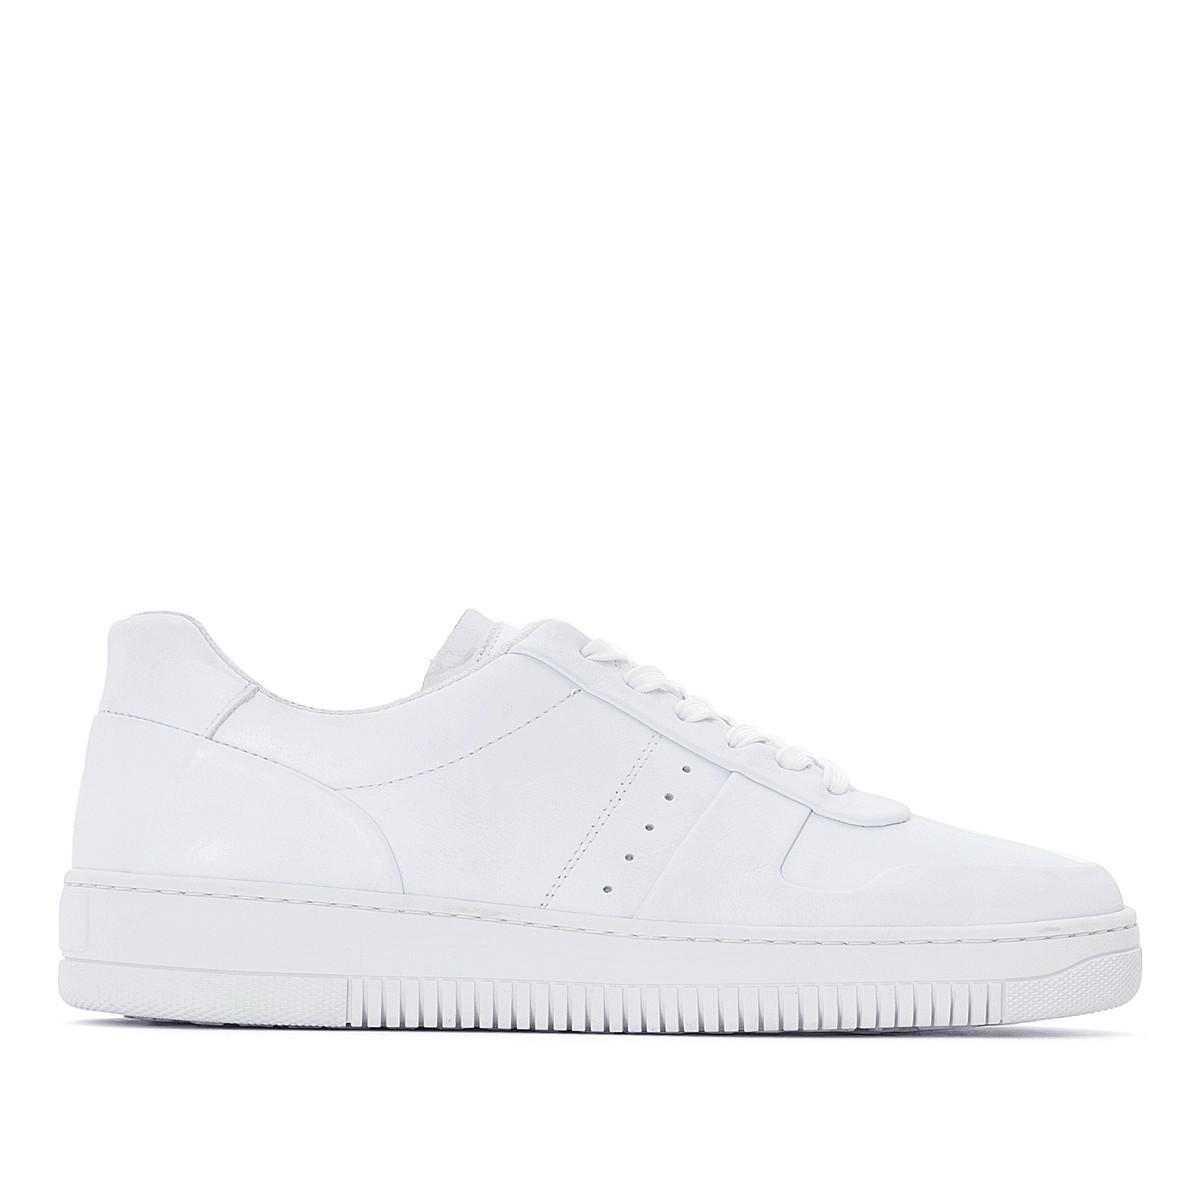 3f116f0a7df9e Lyst - La Redoute Leather Trainers in White for Men